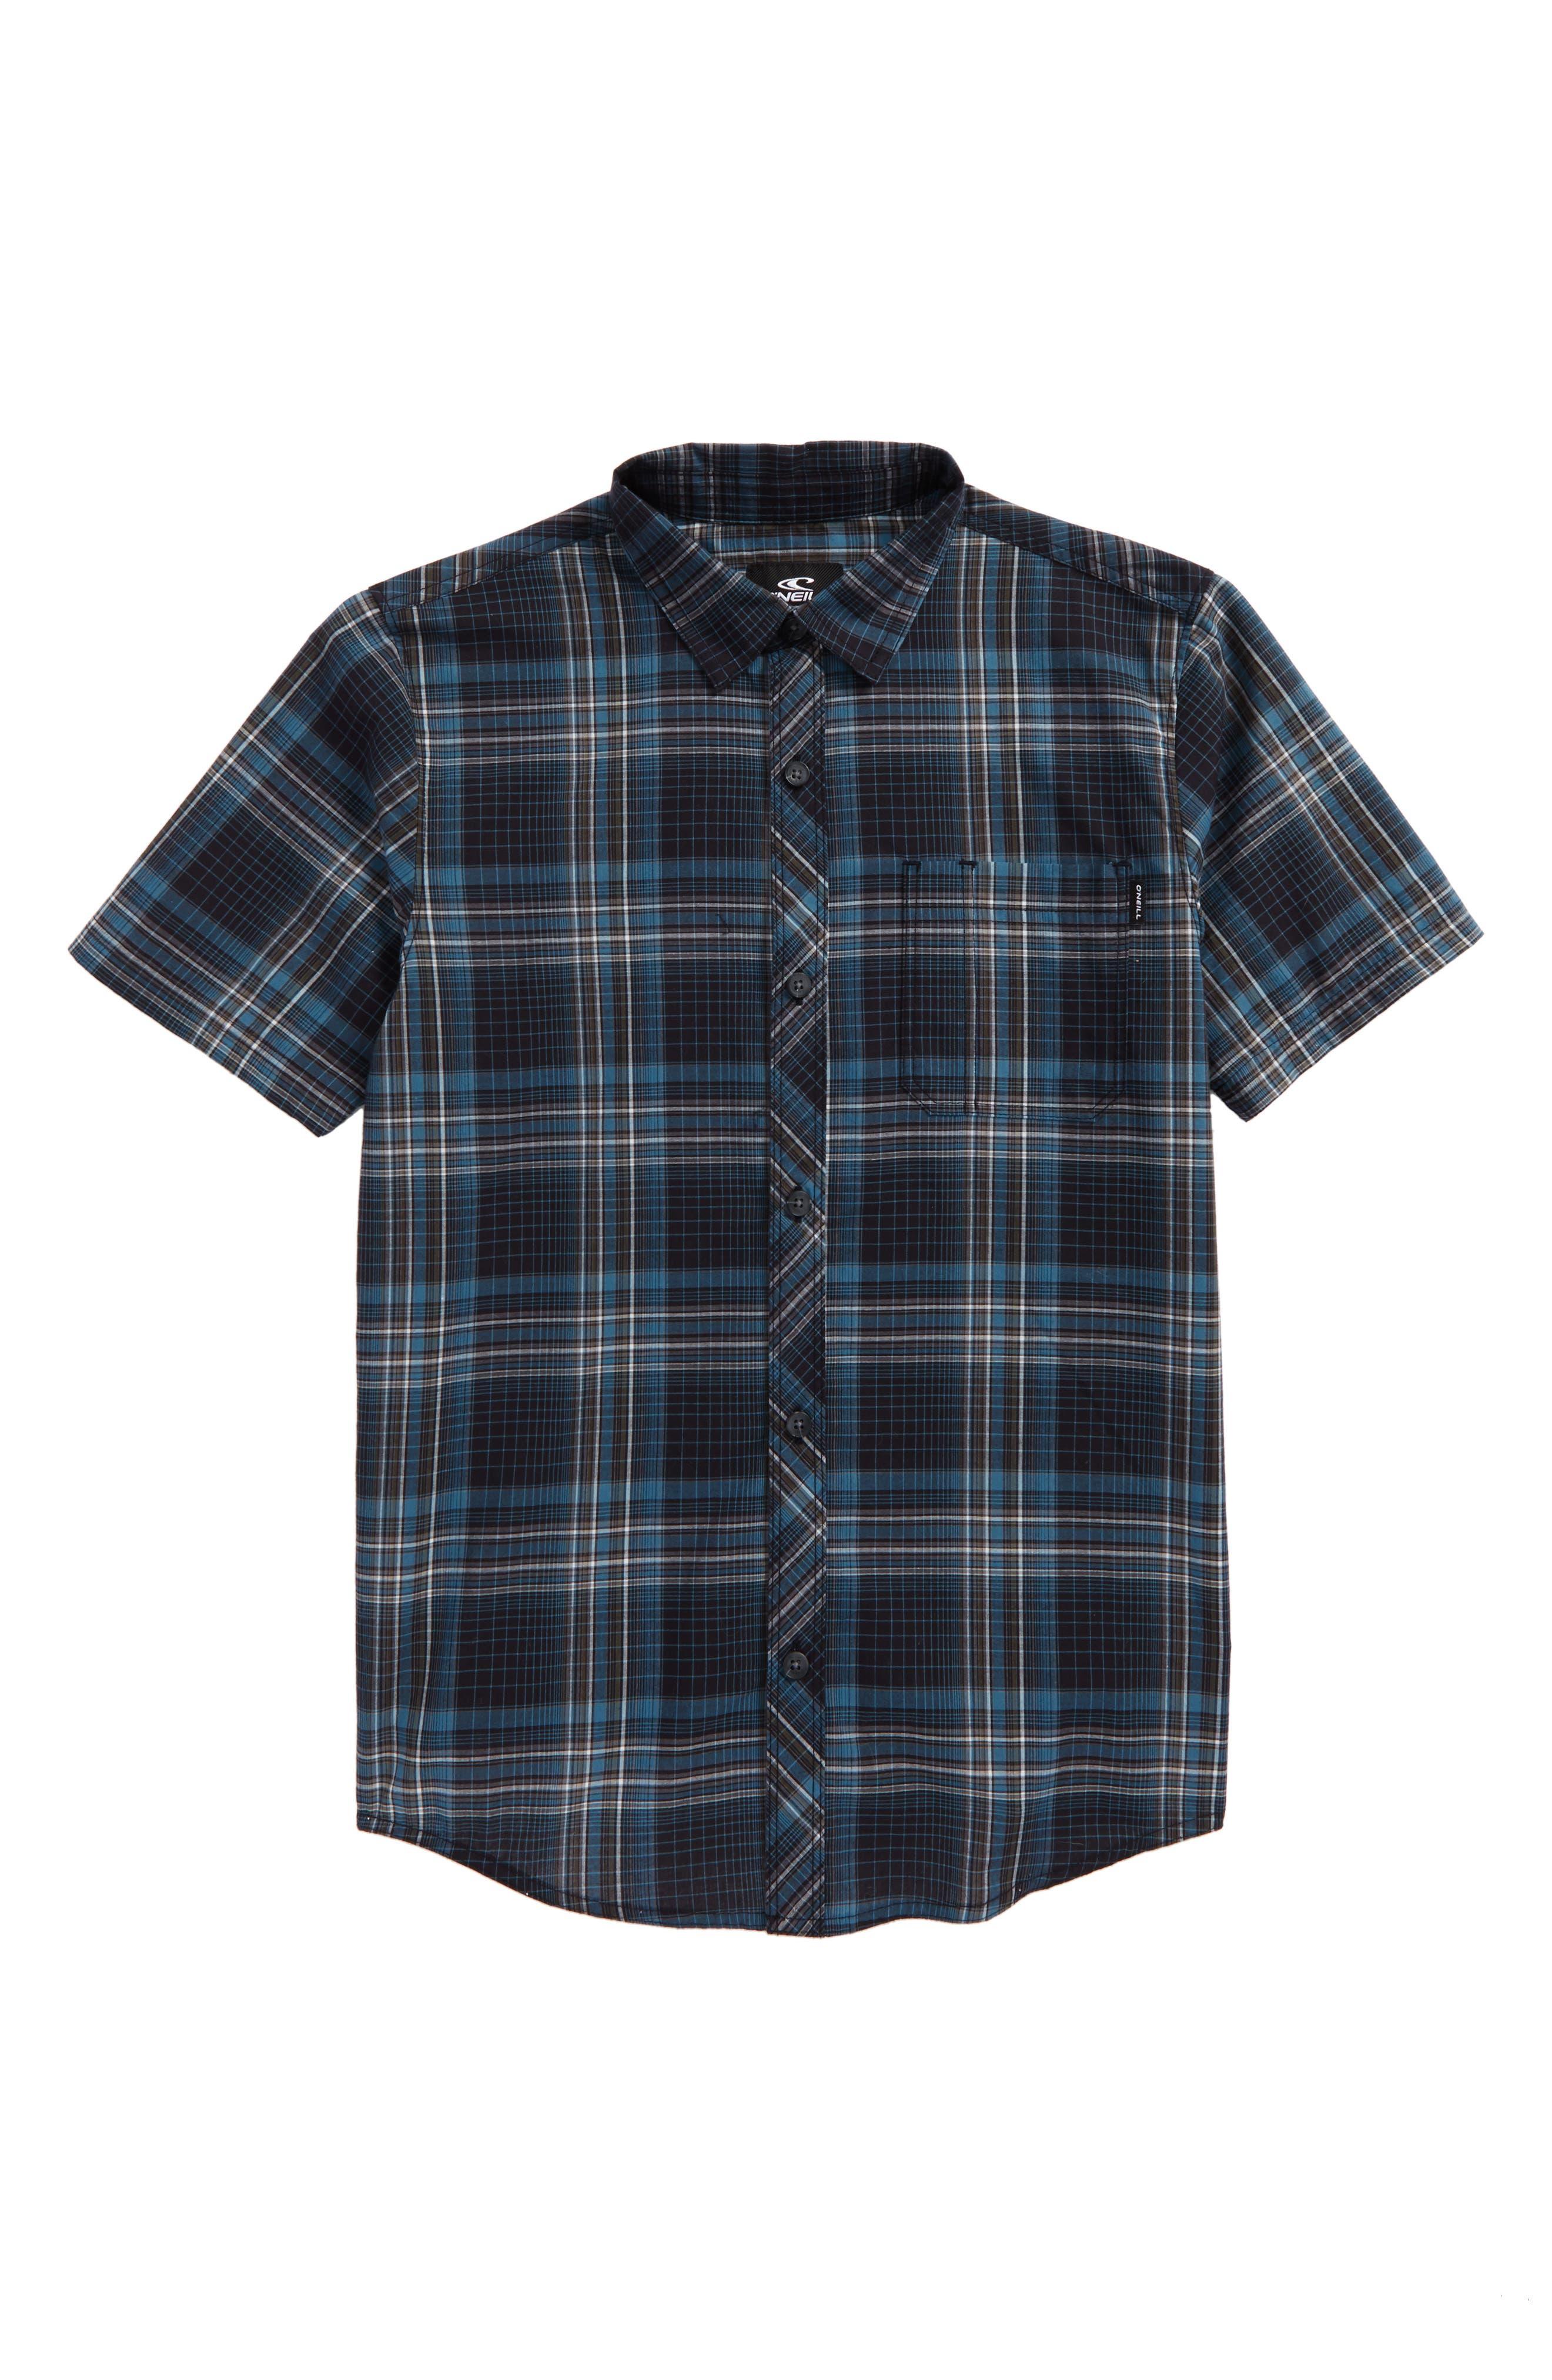 Sturghill Plaid Woven Shirt,                             Main thumbnail 2, color,